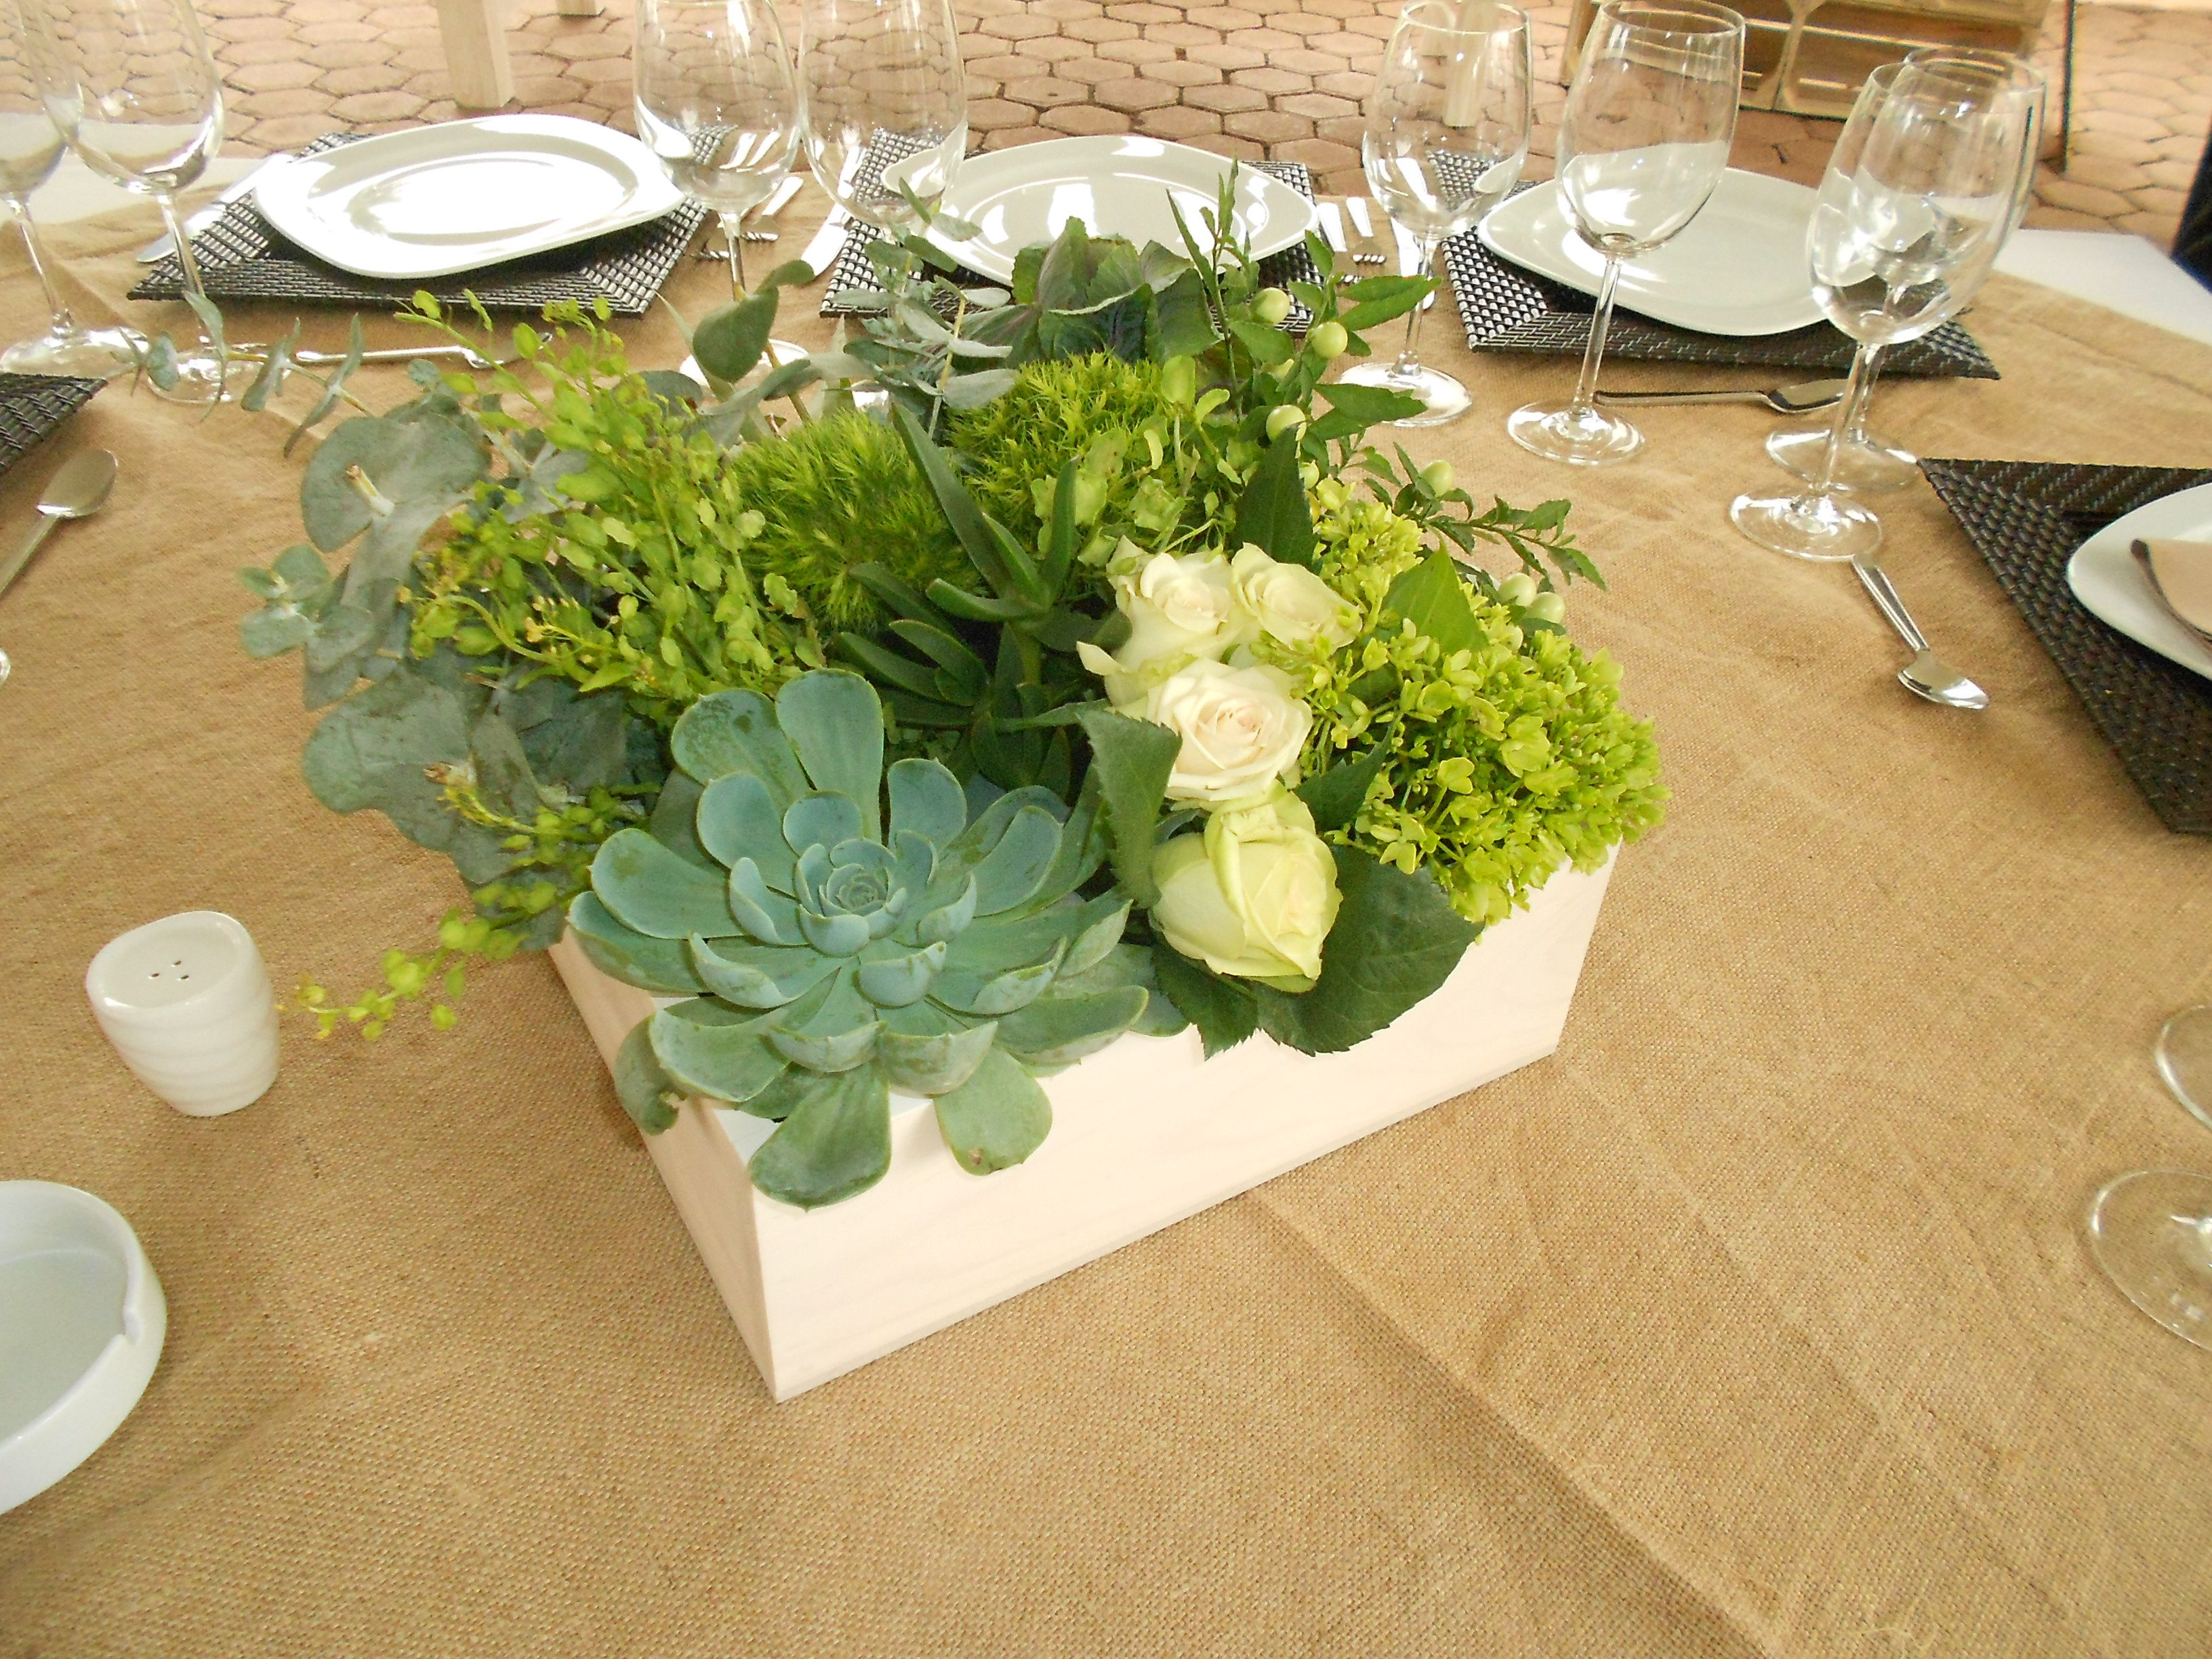 Centros de mesa con suculentas en caja de madera vintage for Centros de mesa de madera